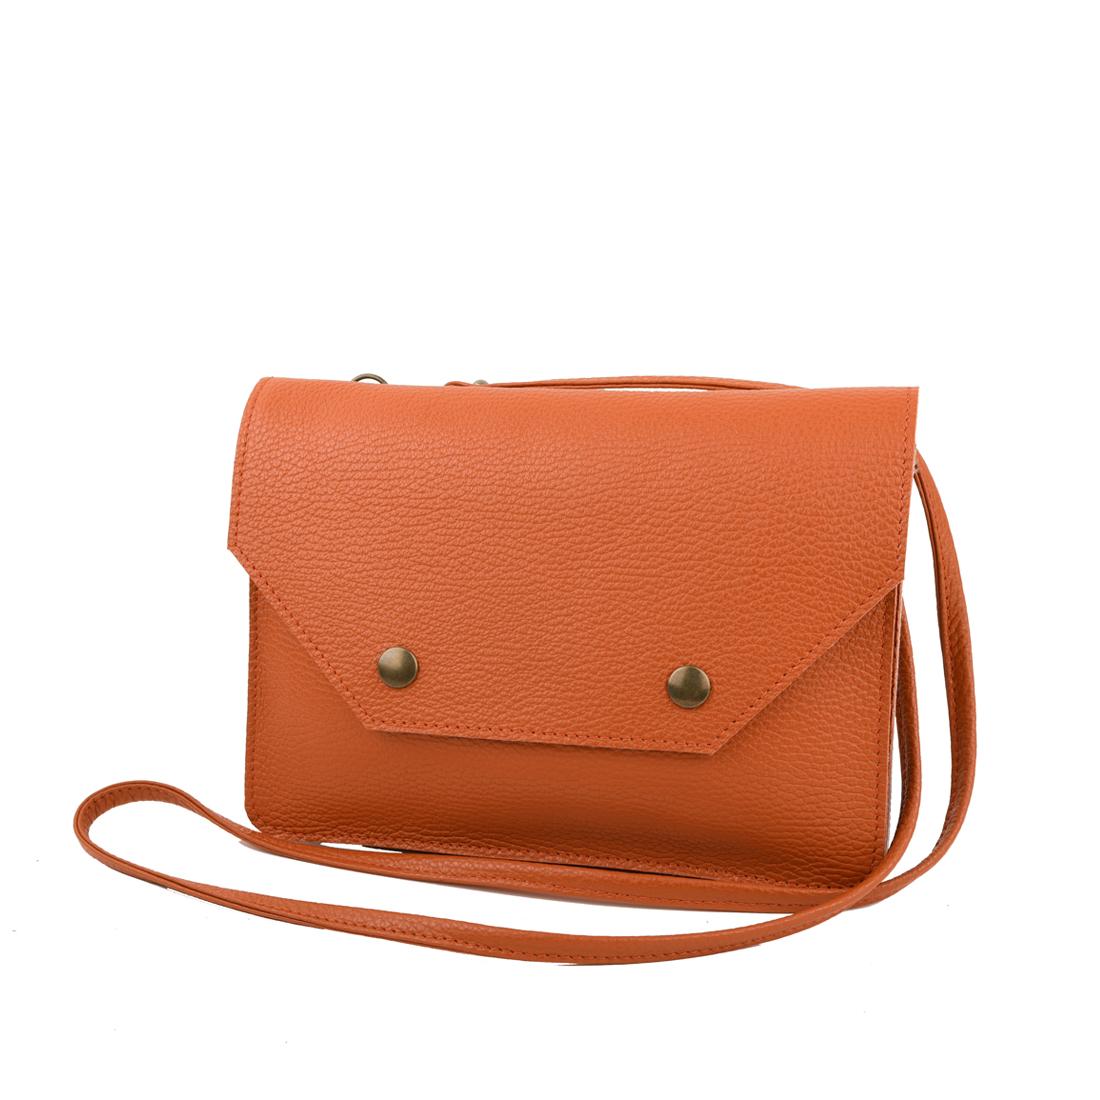 Zara Burnt Orange Across Body Bag